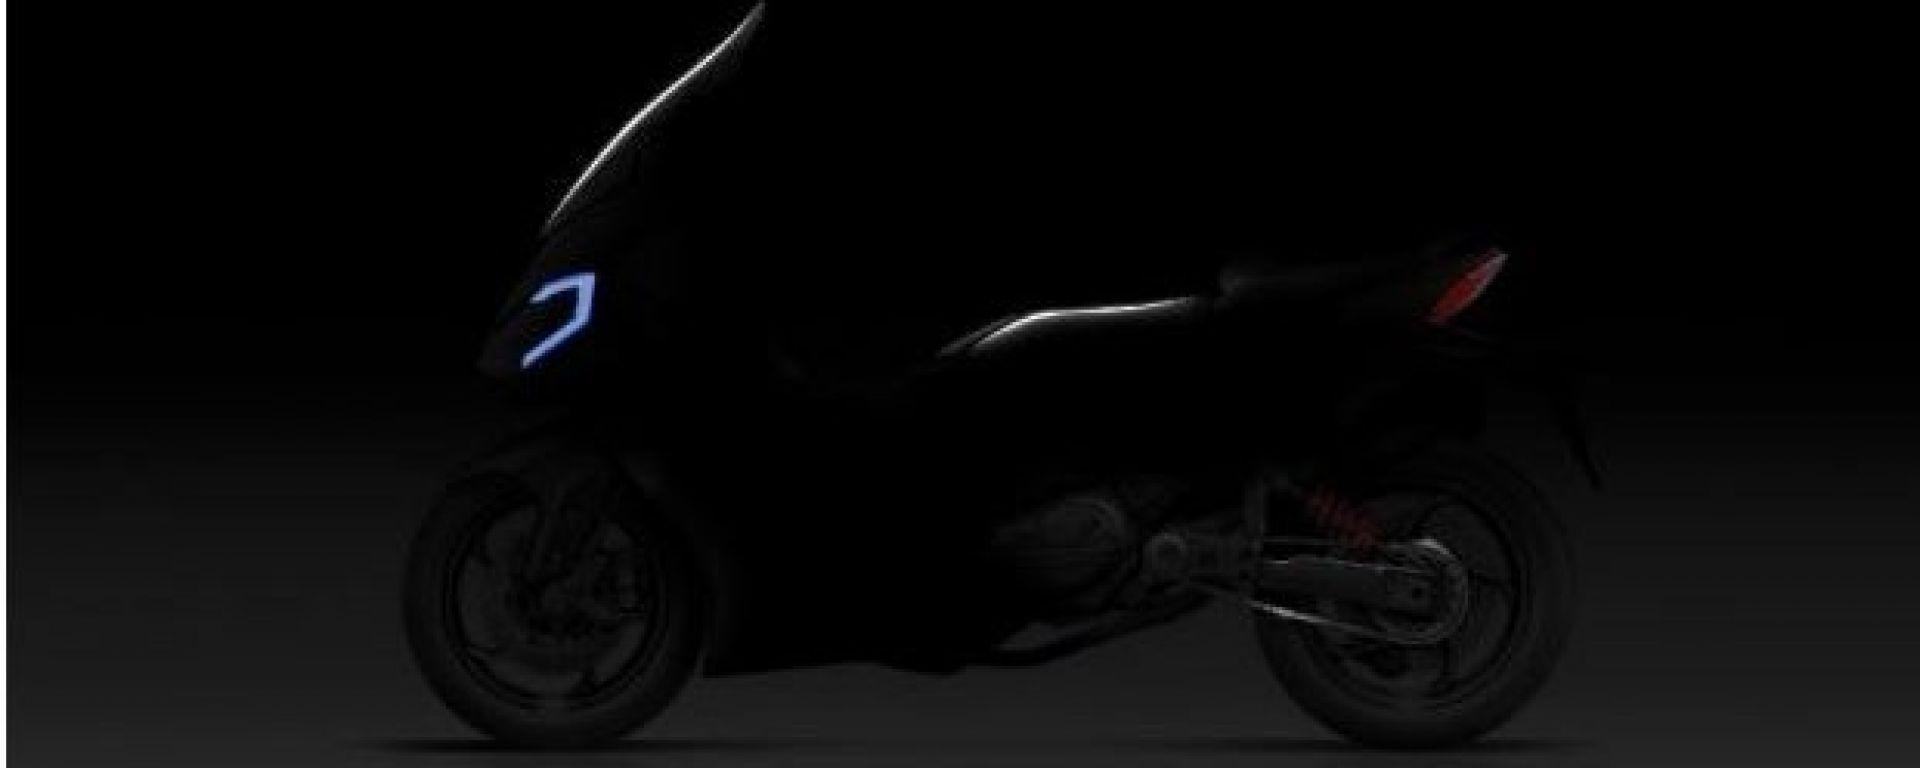 SYM maxi-scooter crossover Eicma 2017